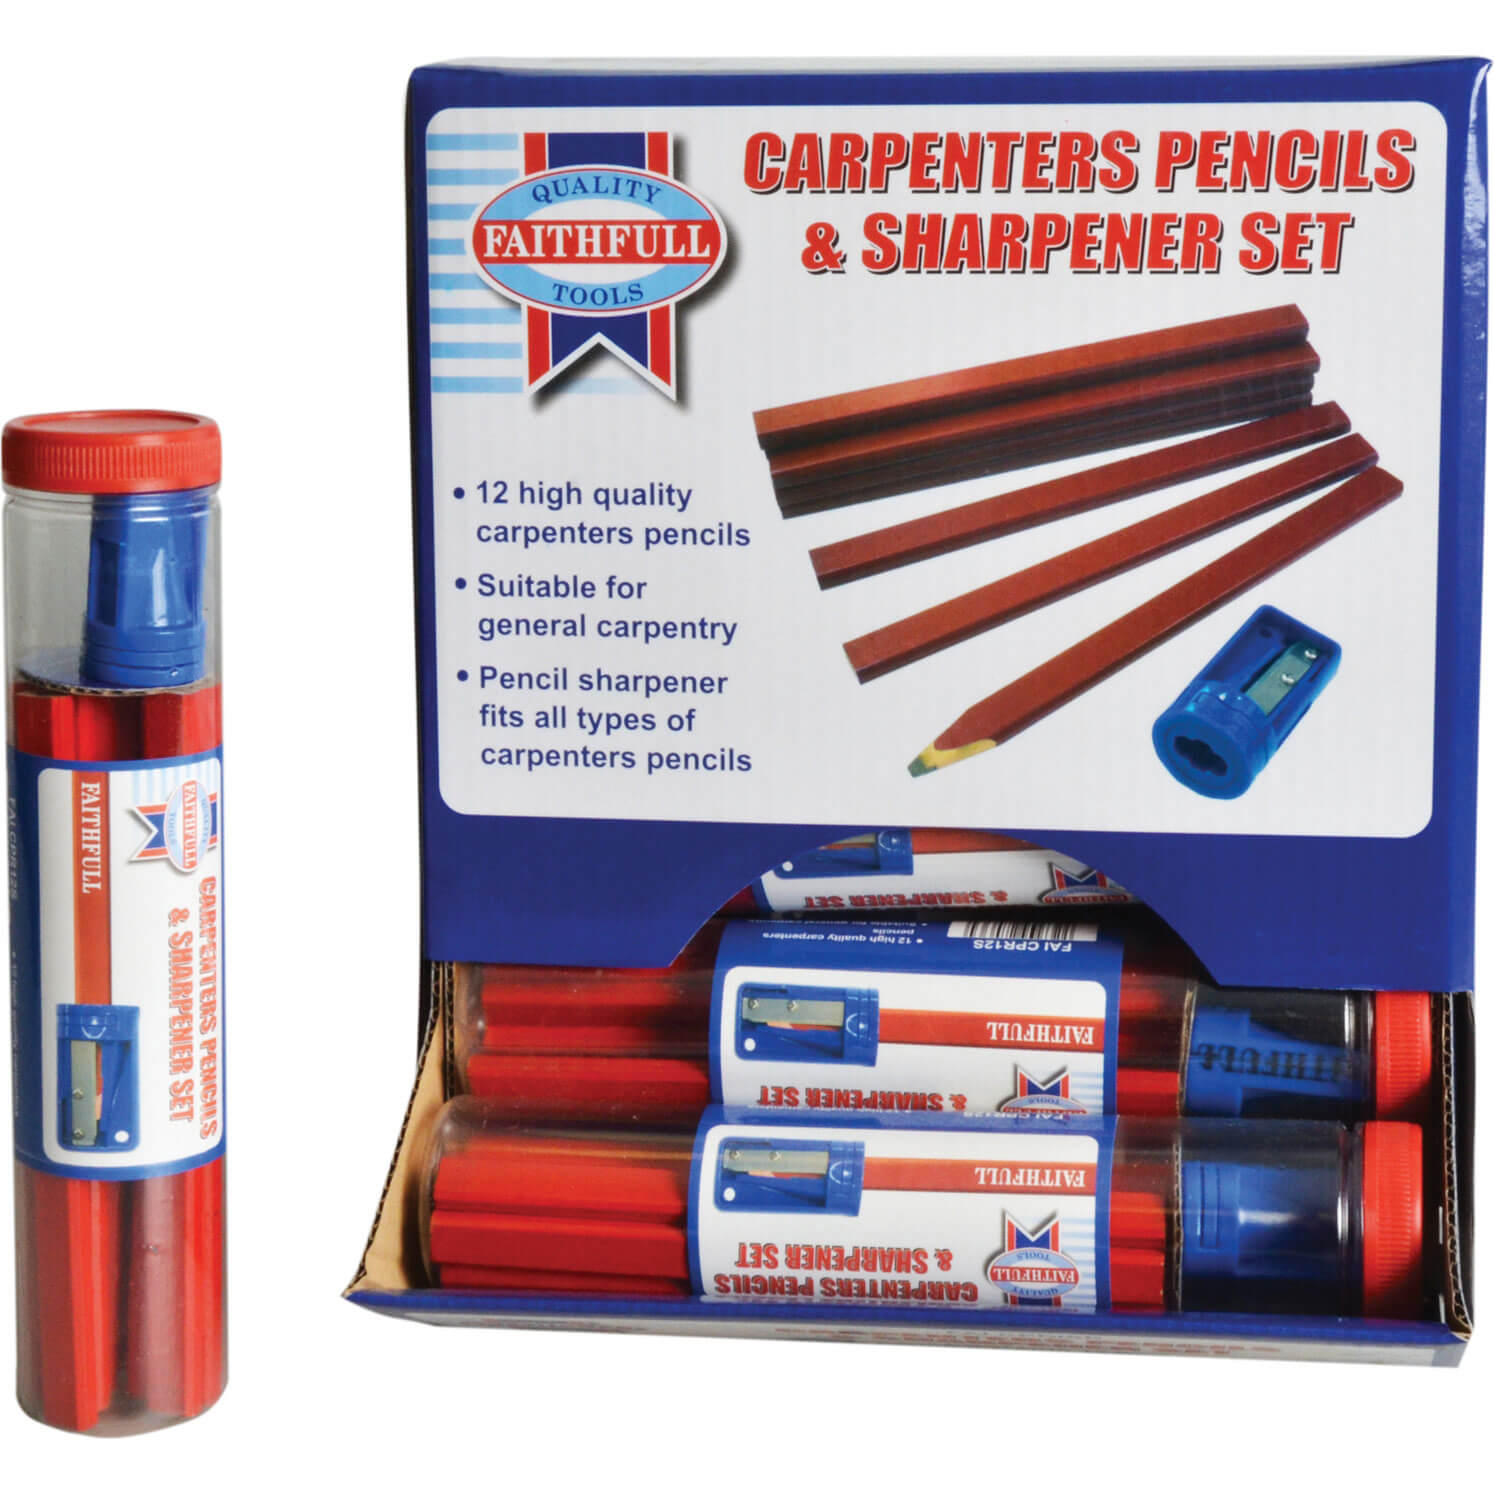 Image of Faithfull Carpenters Pencils & Sharpener Pack of 12